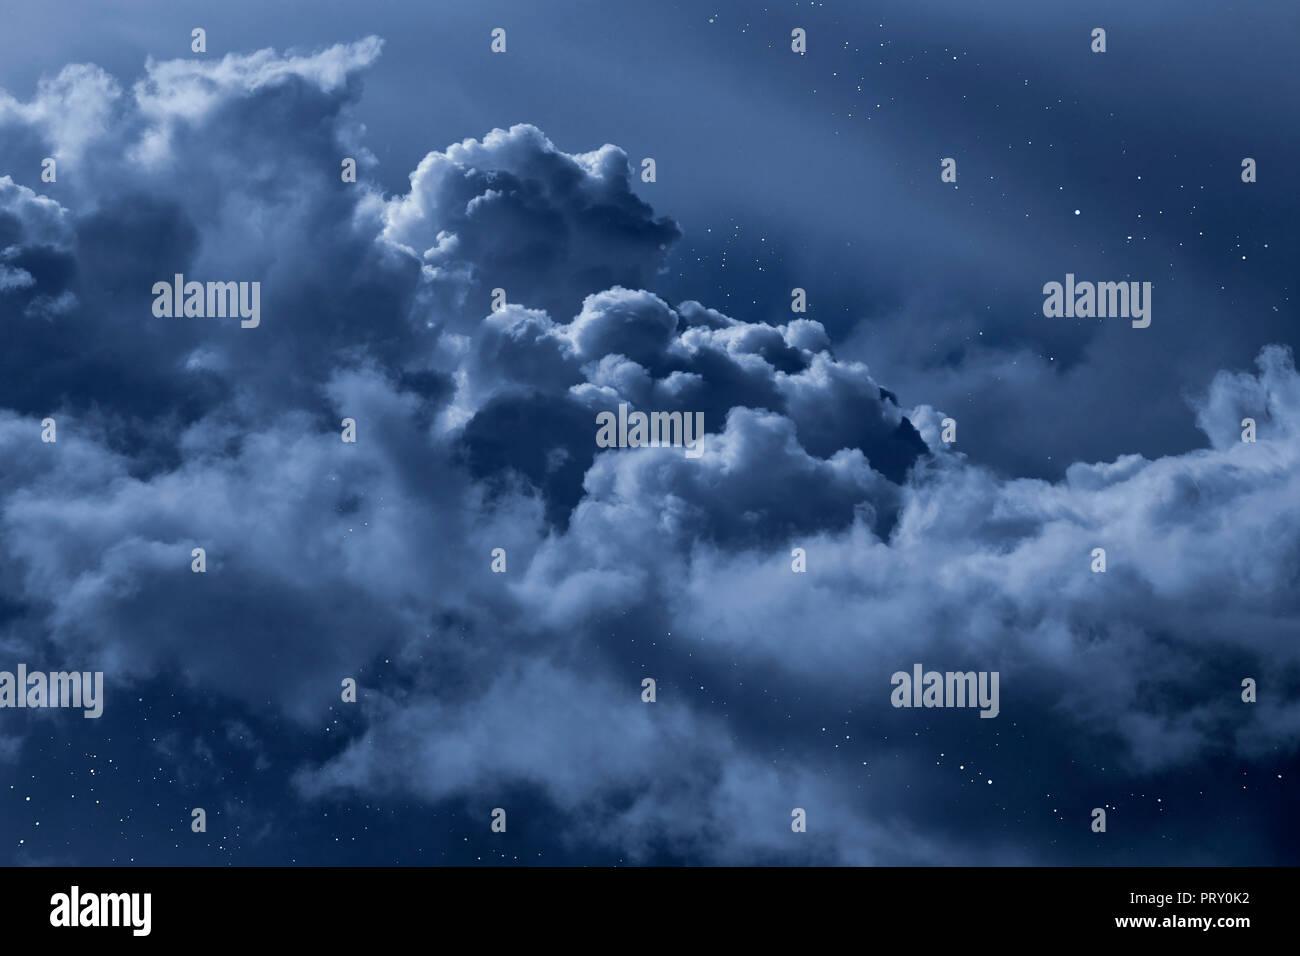 Cloudy Night Sky Stars Cloudy Sky Seen...